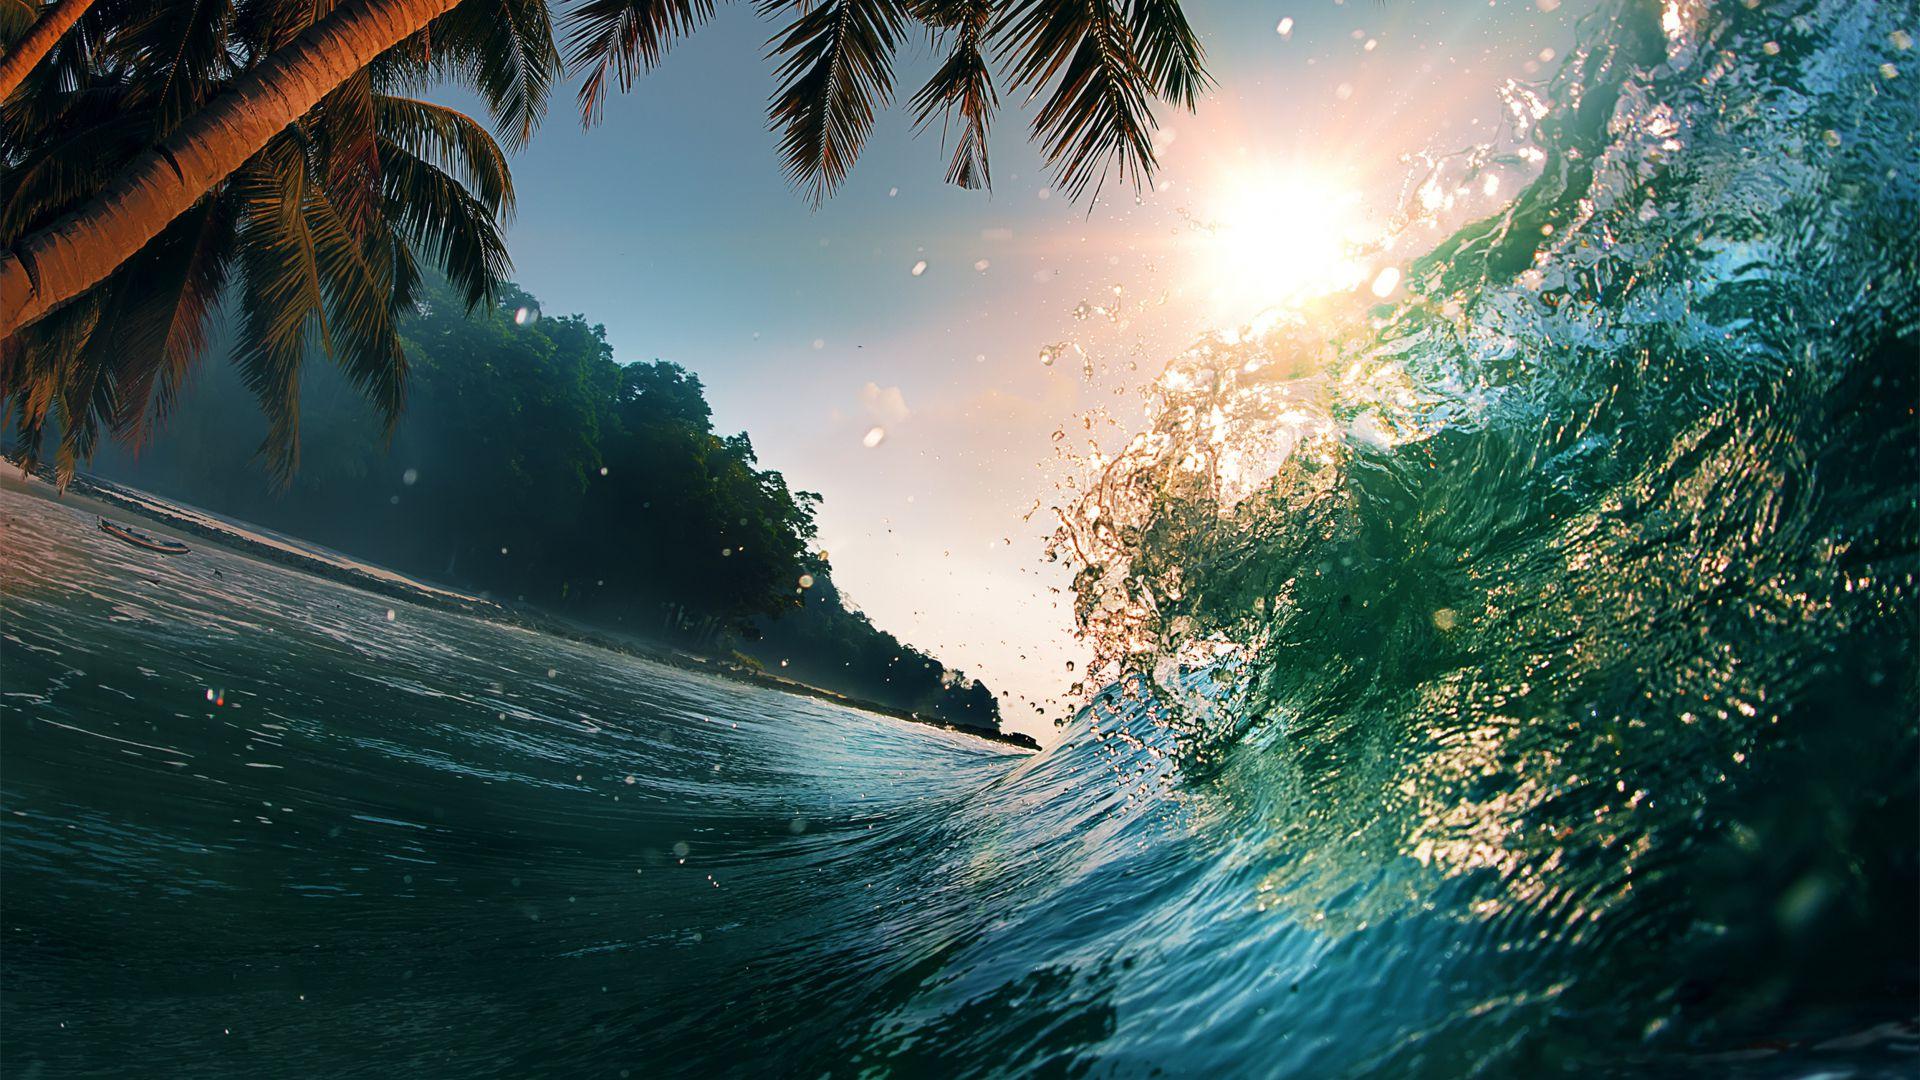 Best Wallpaper Macbook Wave - 5490  You Should Have_259951.jpg